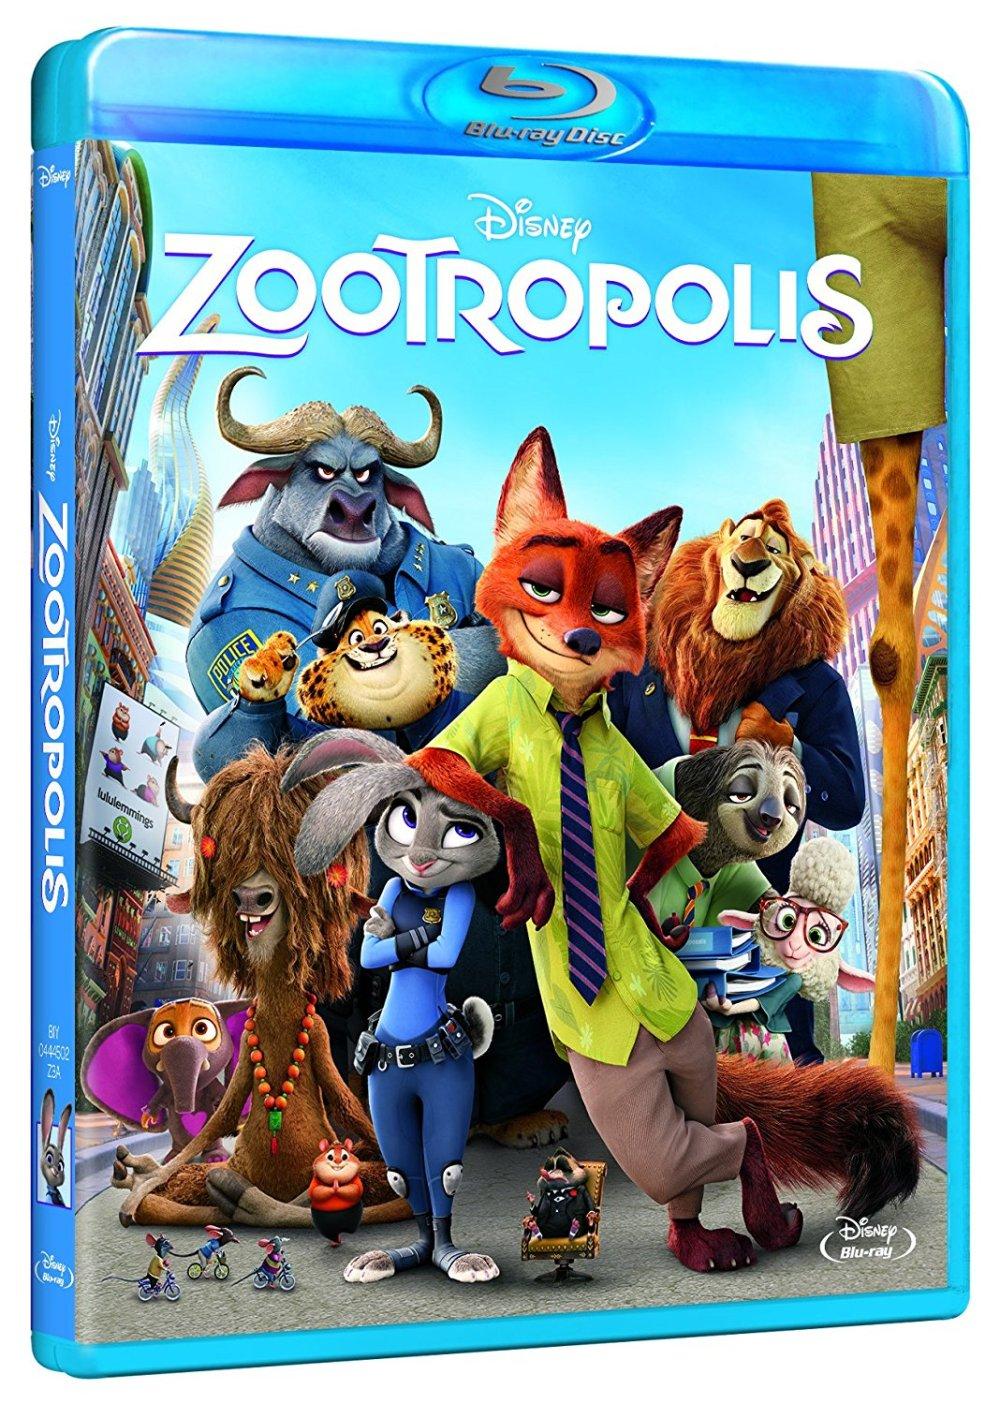 zootopia-zootropolis-blu-ray-monster-movie-hot_